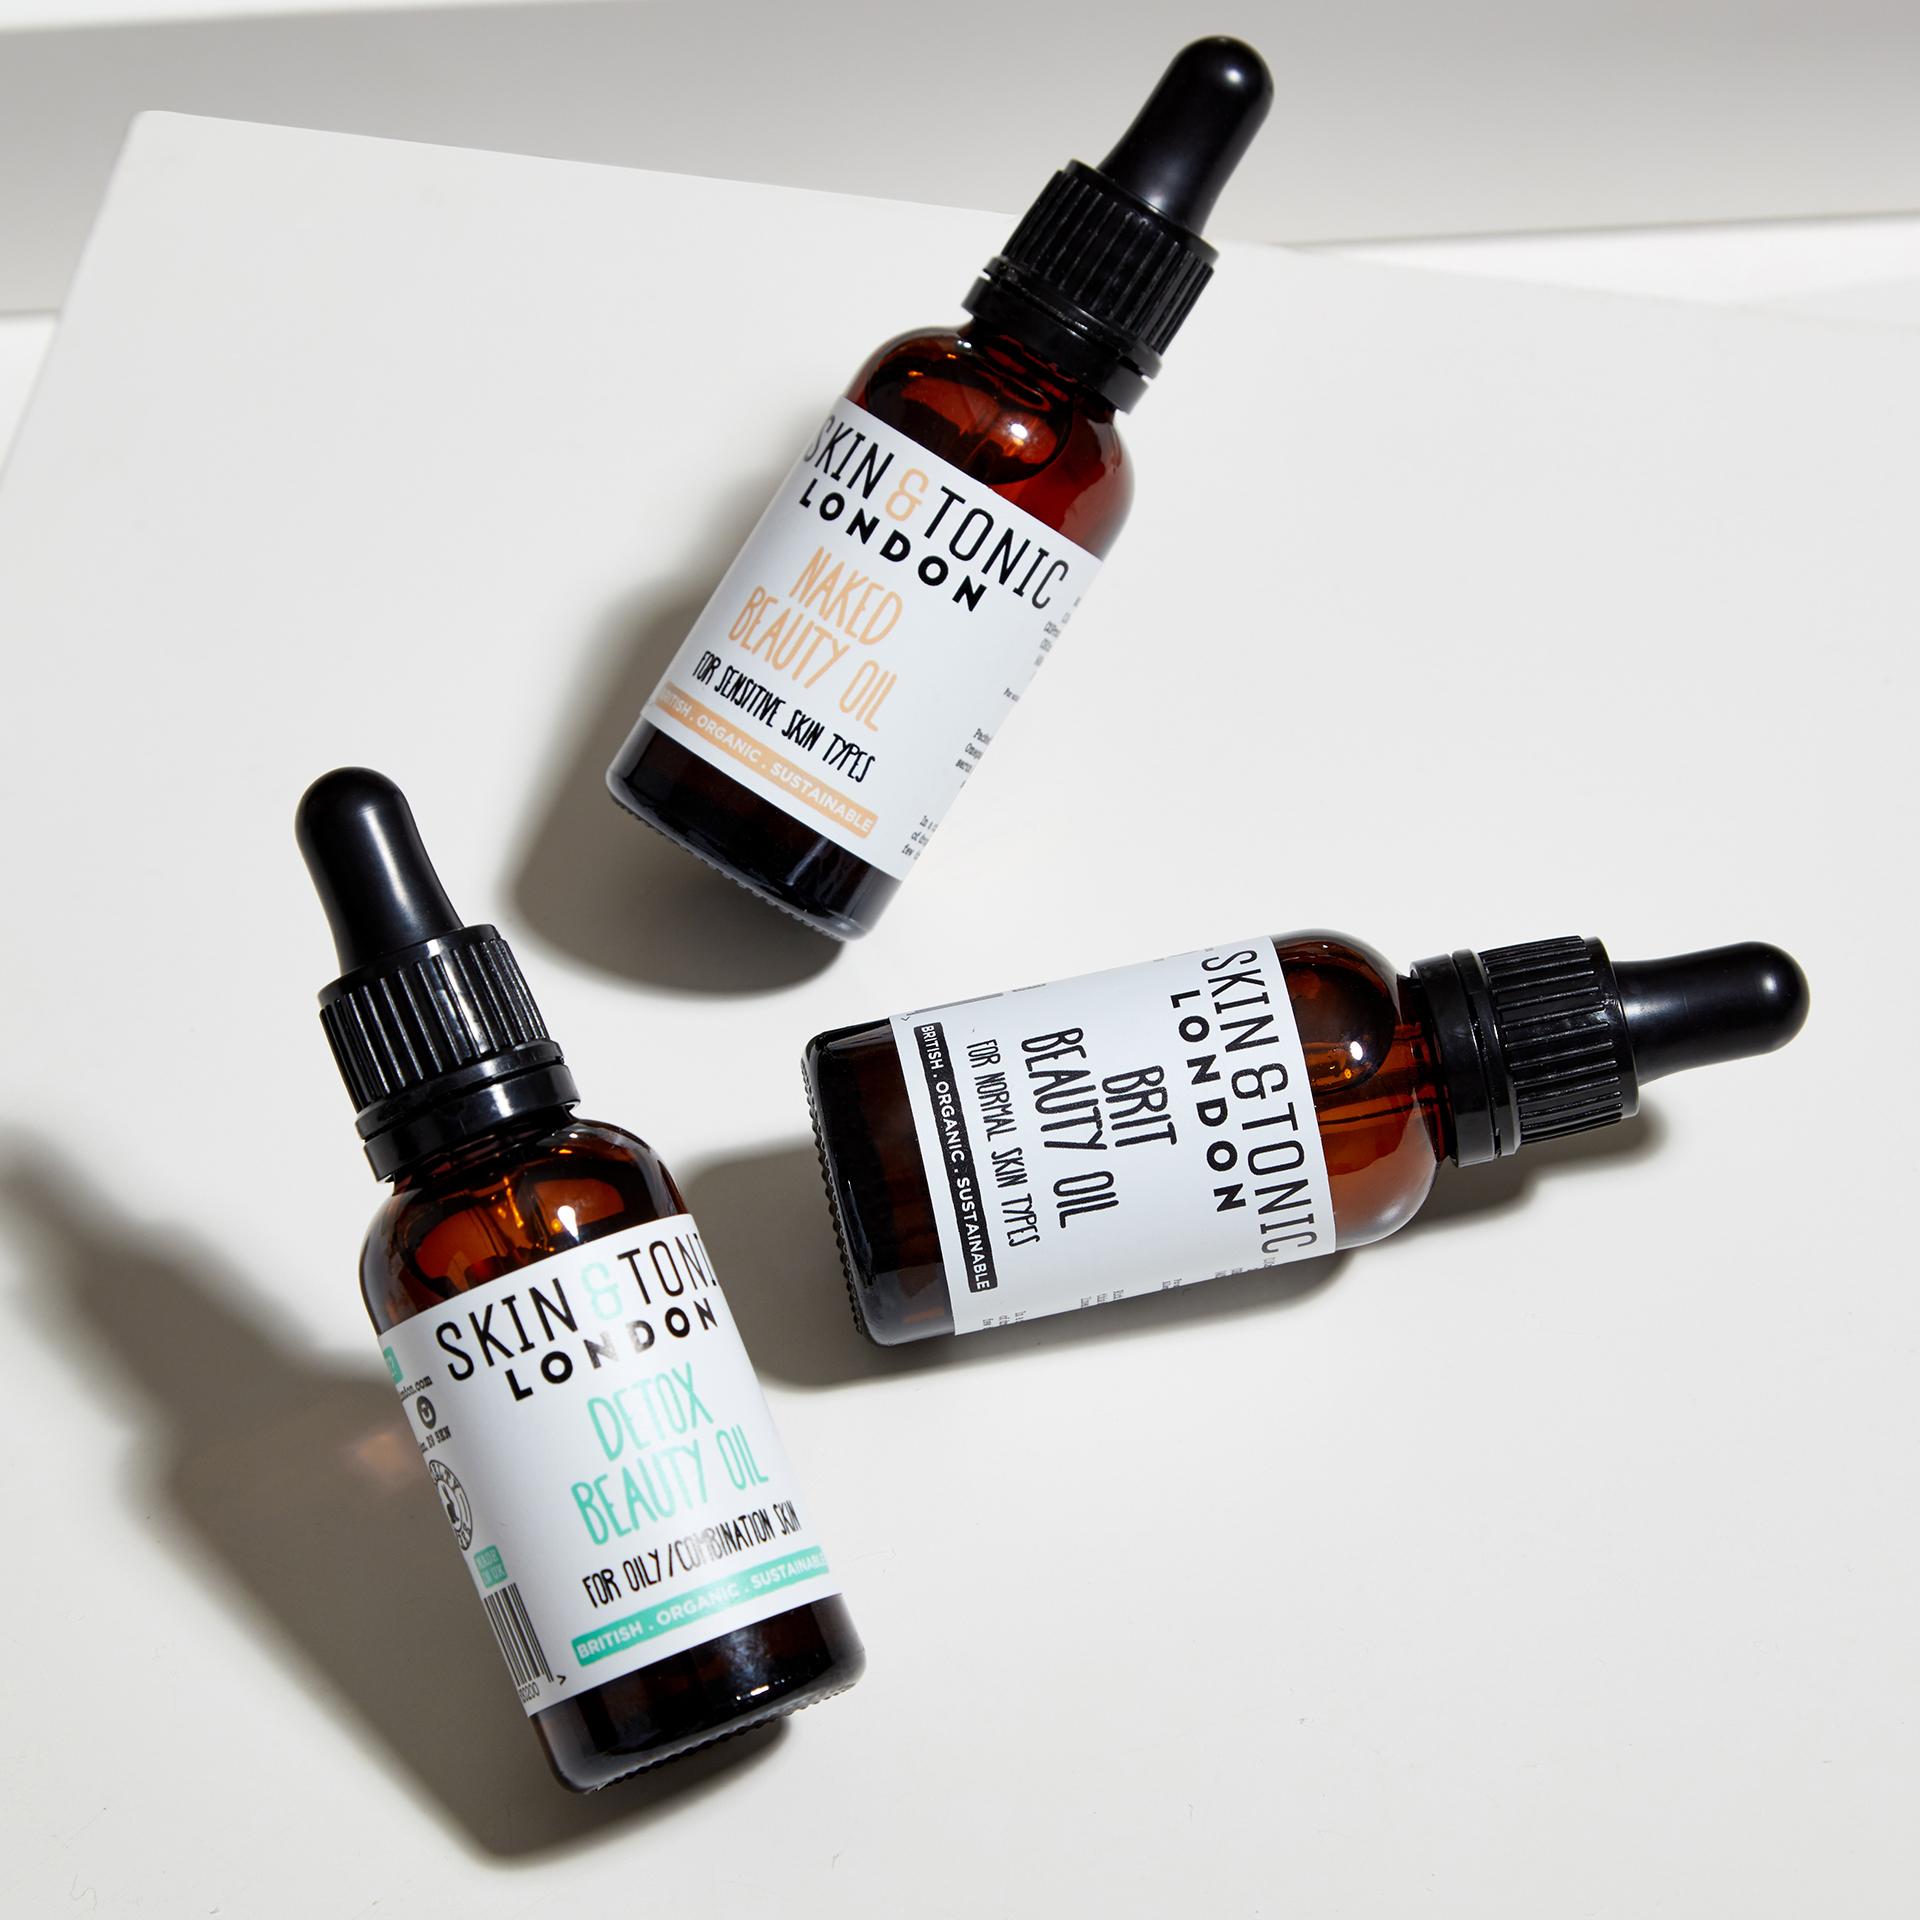 ORGANIC FACIAL OILS skin & tonic natural skincare London vegan skincare organic beauty store